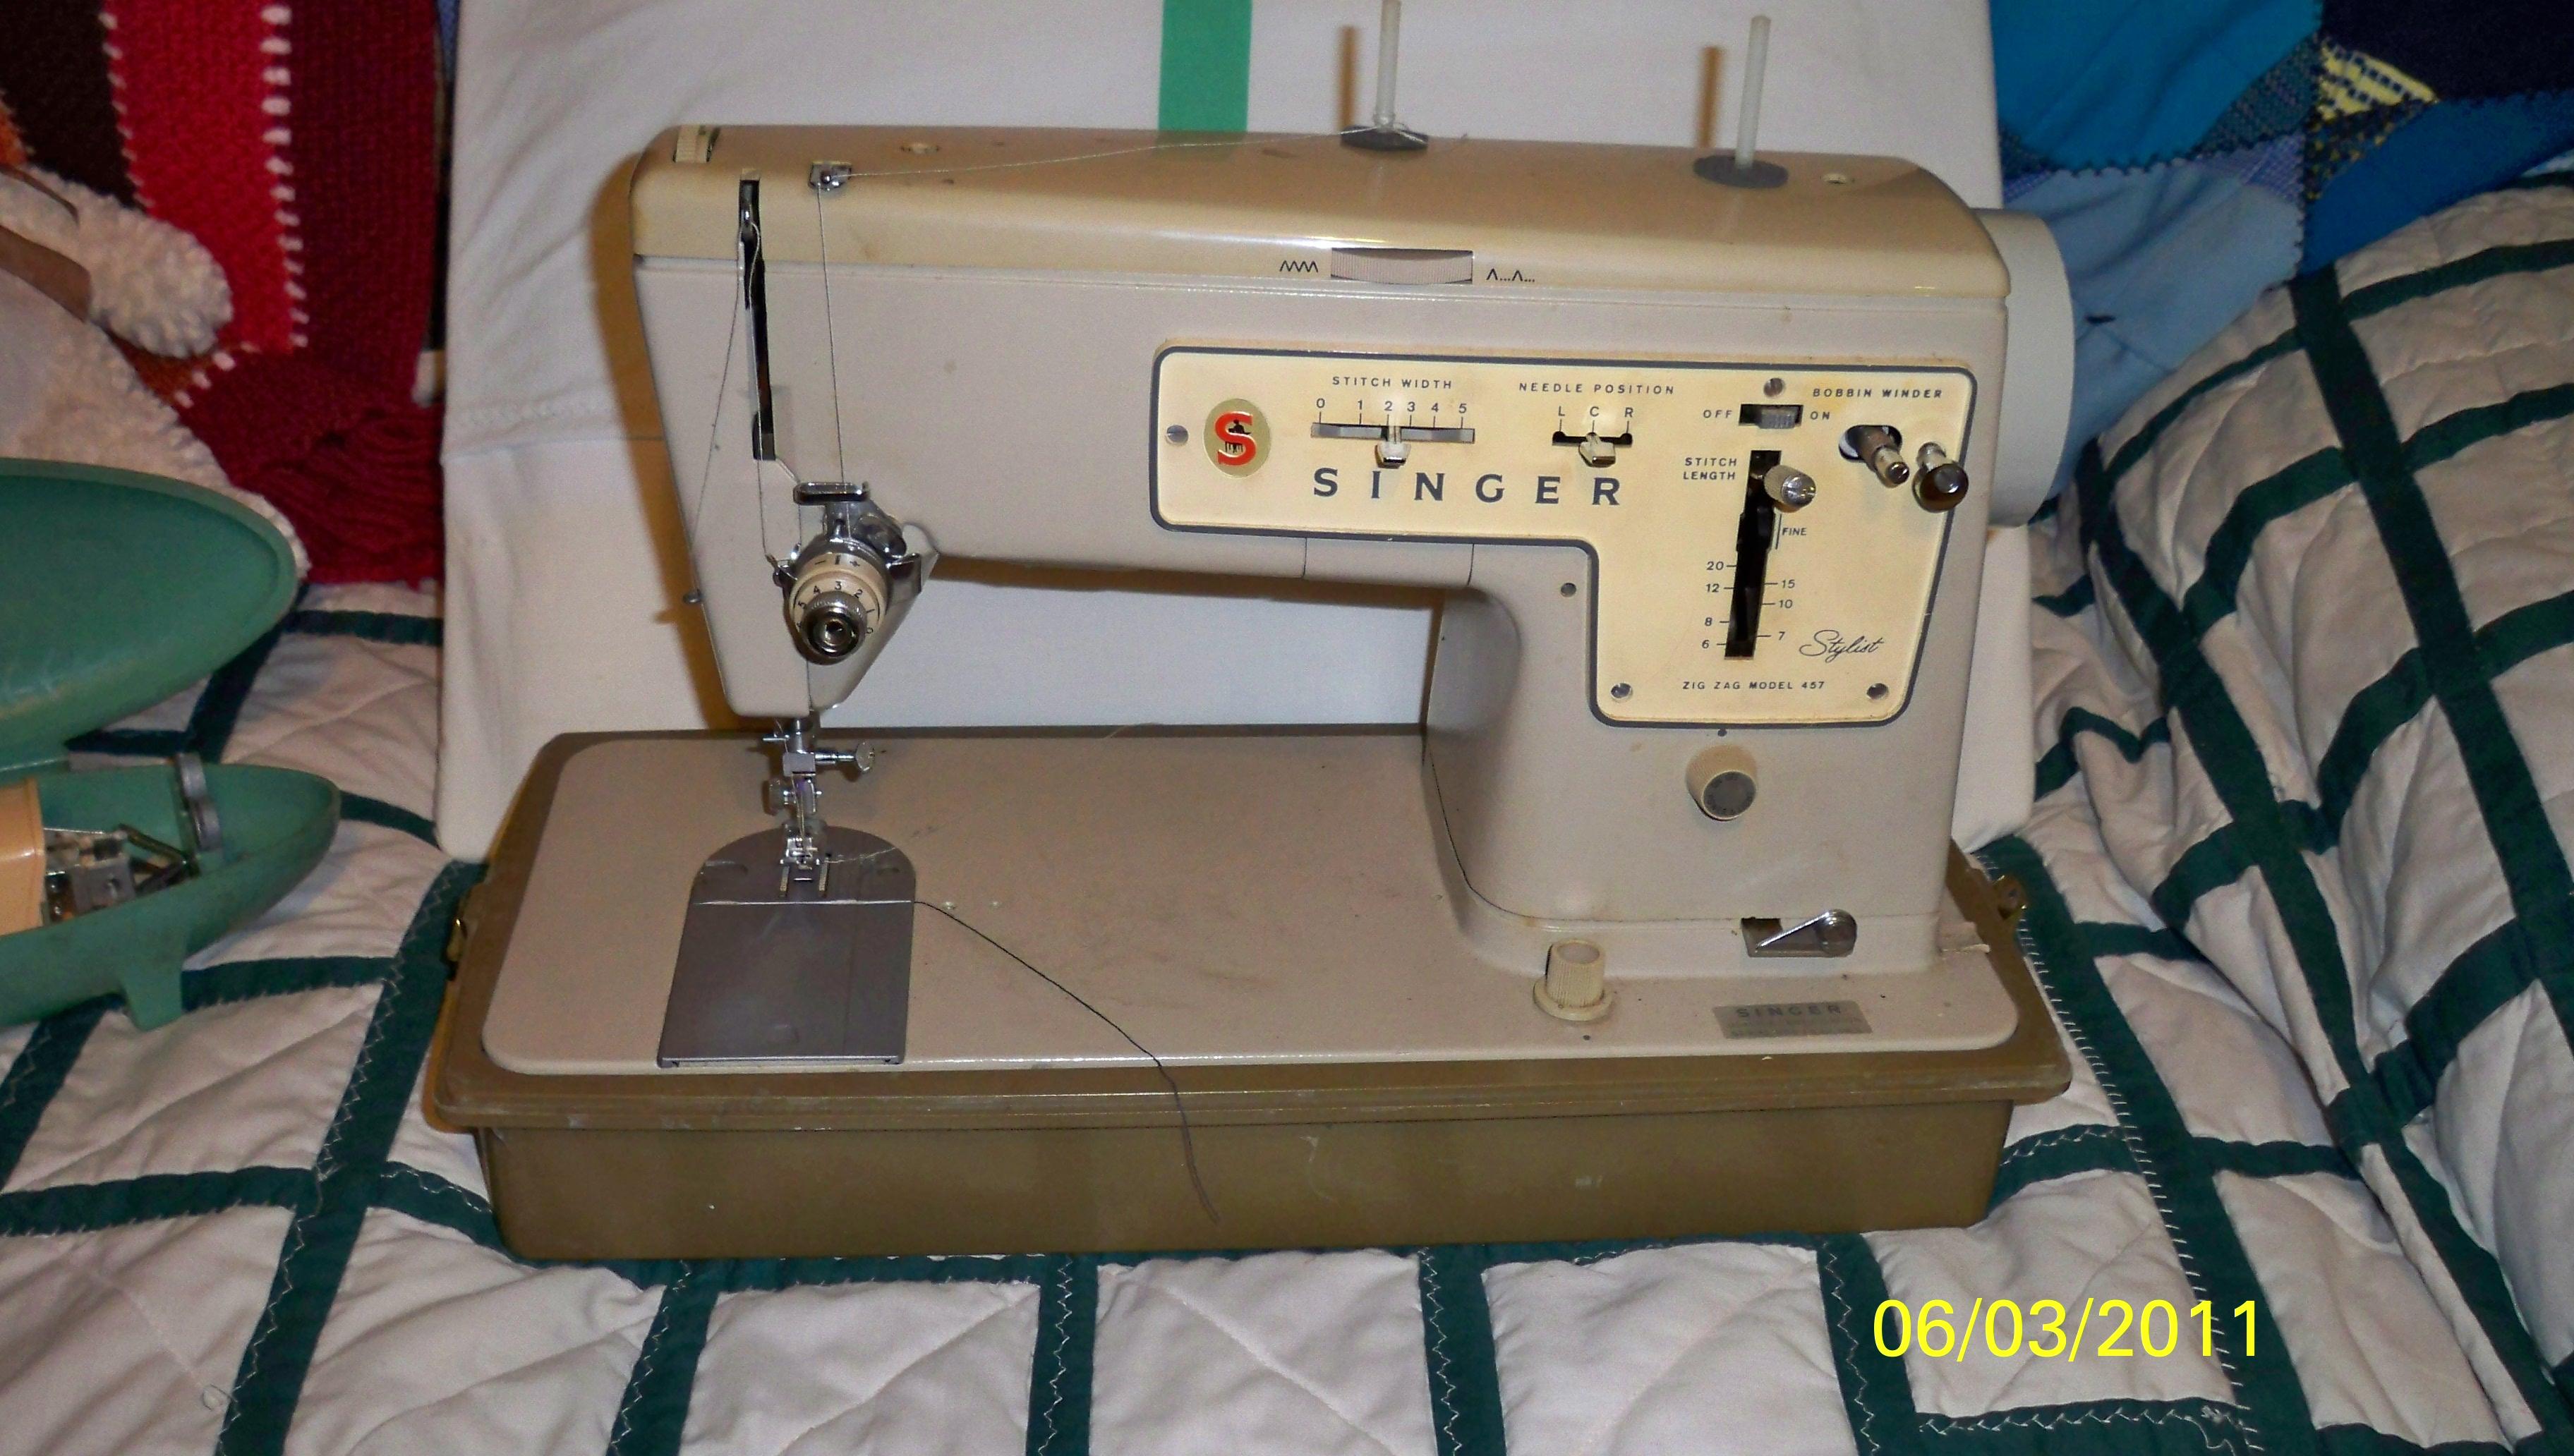 Singer 457 sewing machine instruction manual.